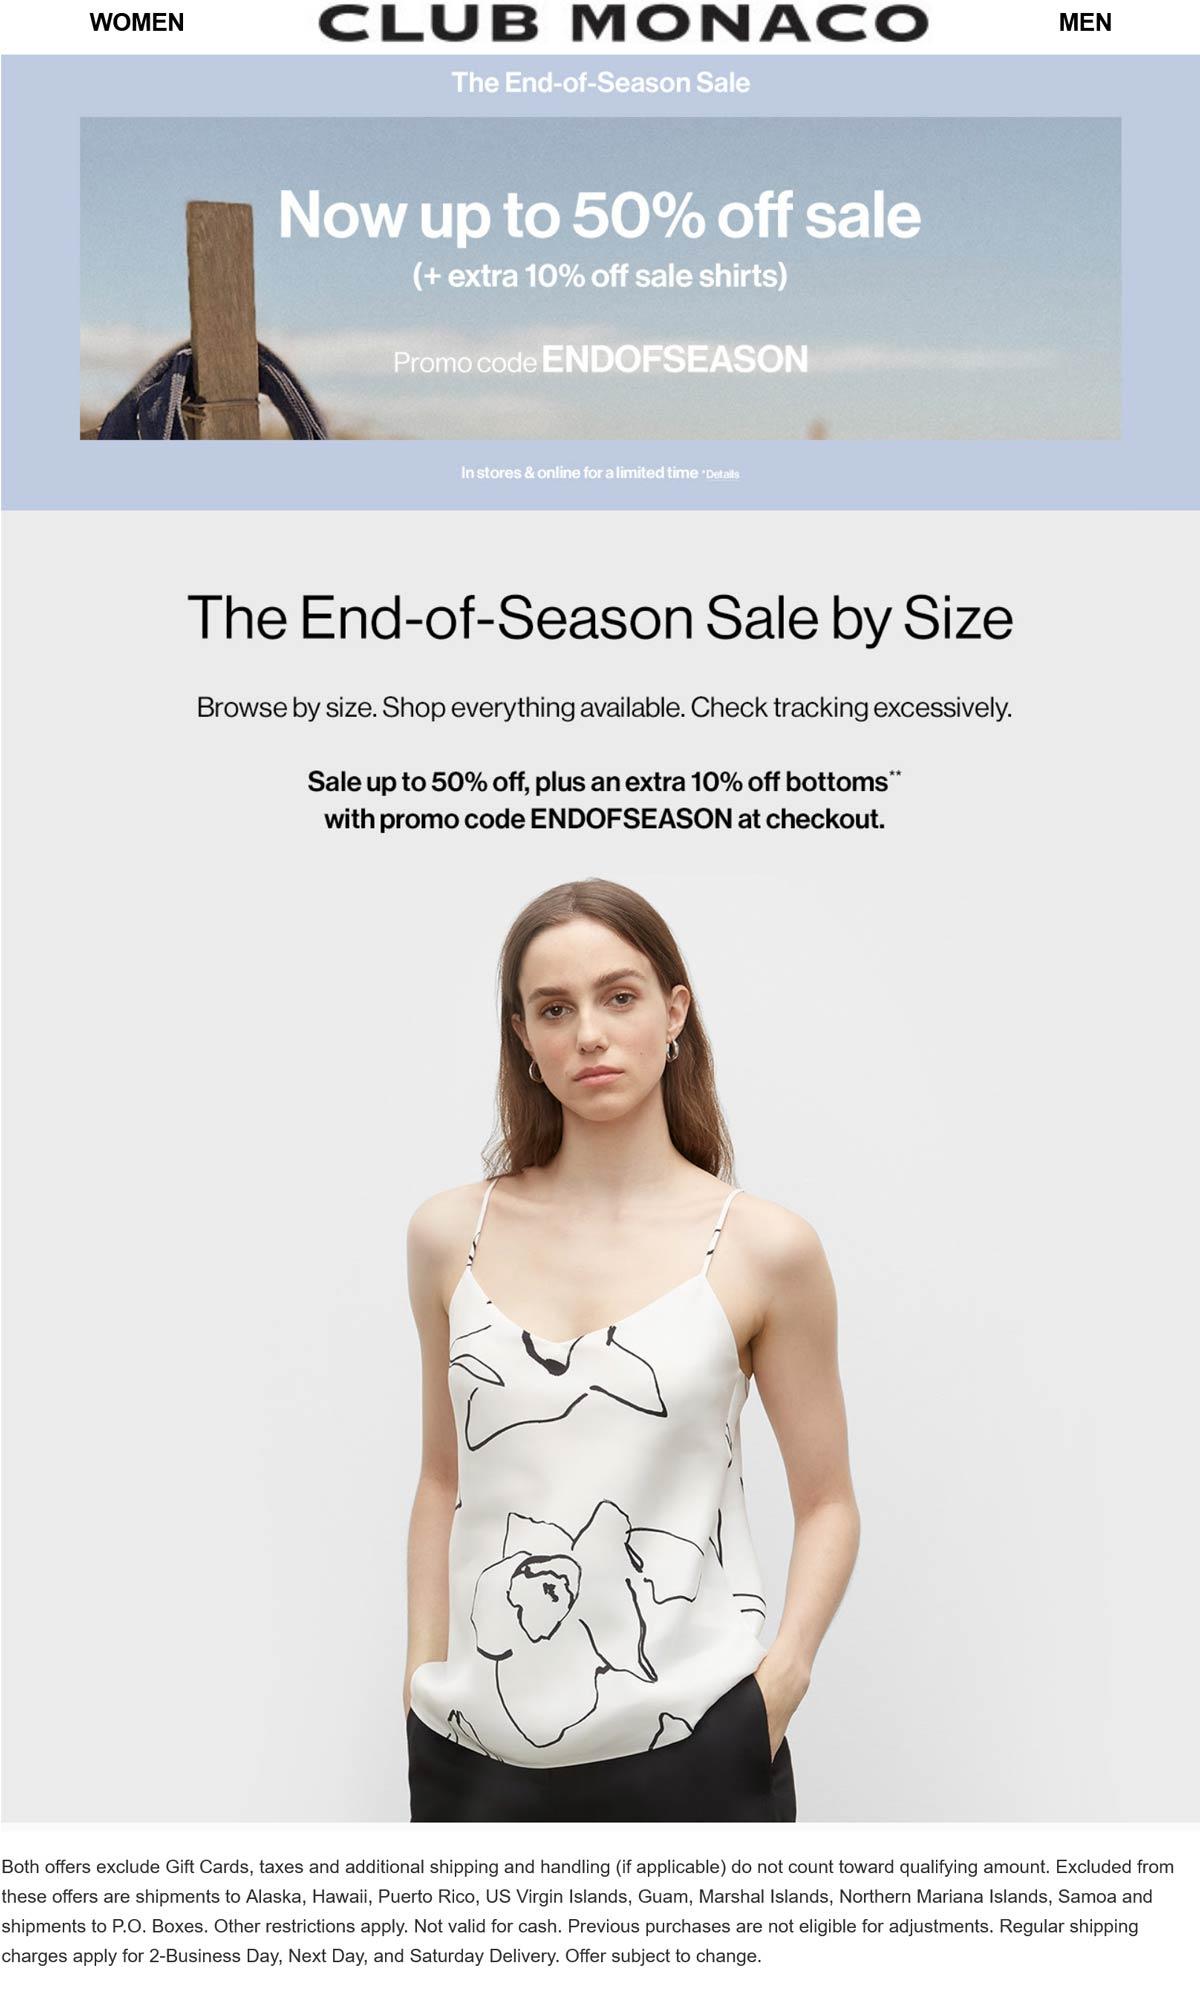 Club Monaco stores Coupon  Extra 10-50% off sale shirts & more at Club Monaco, or online via promo code ENDOFSEASON #clubmonaco